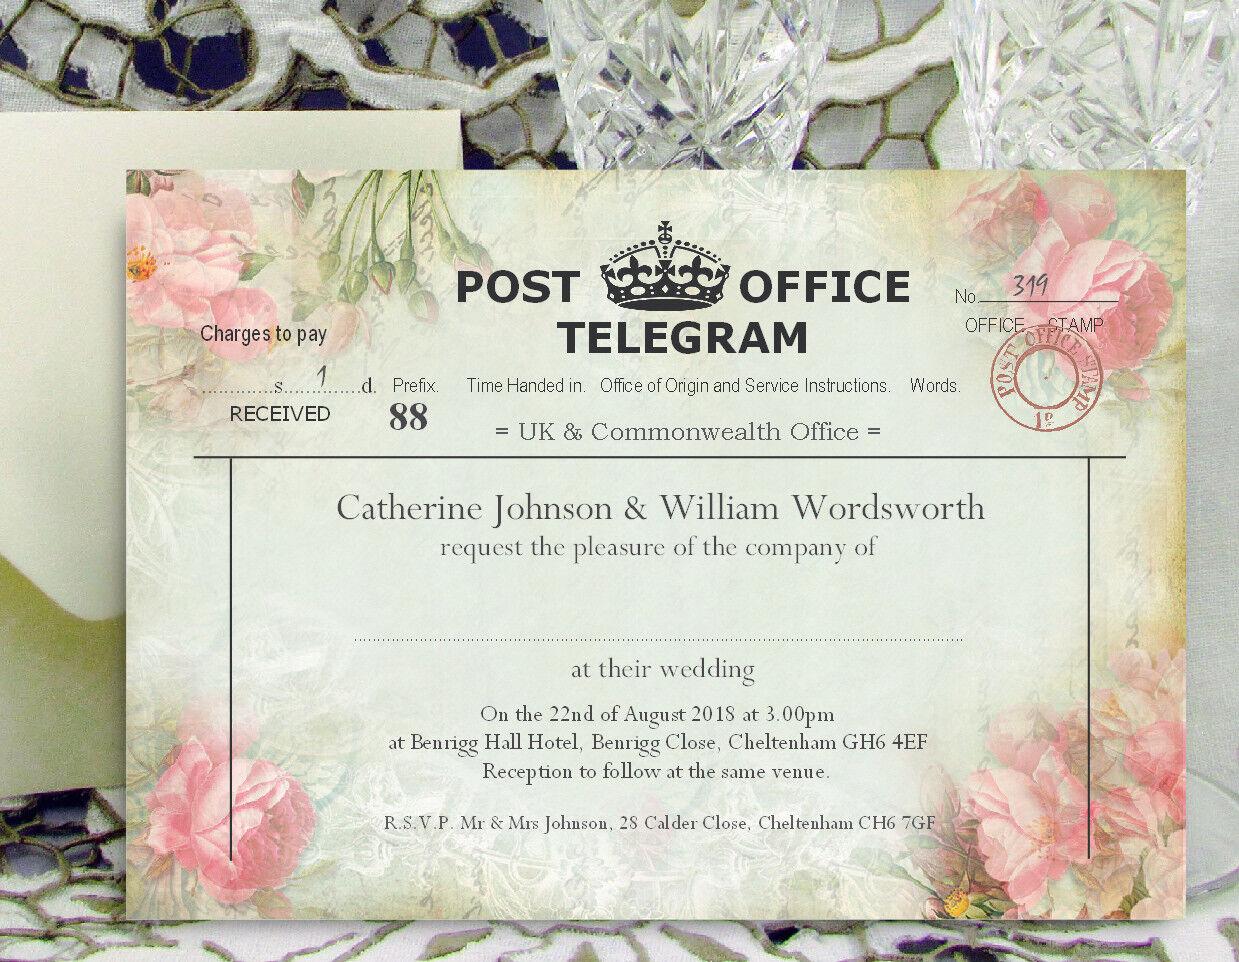 PERSONALISED WEDDING INVITATIONS Rustic Flower Telegram Invites and Envelopes